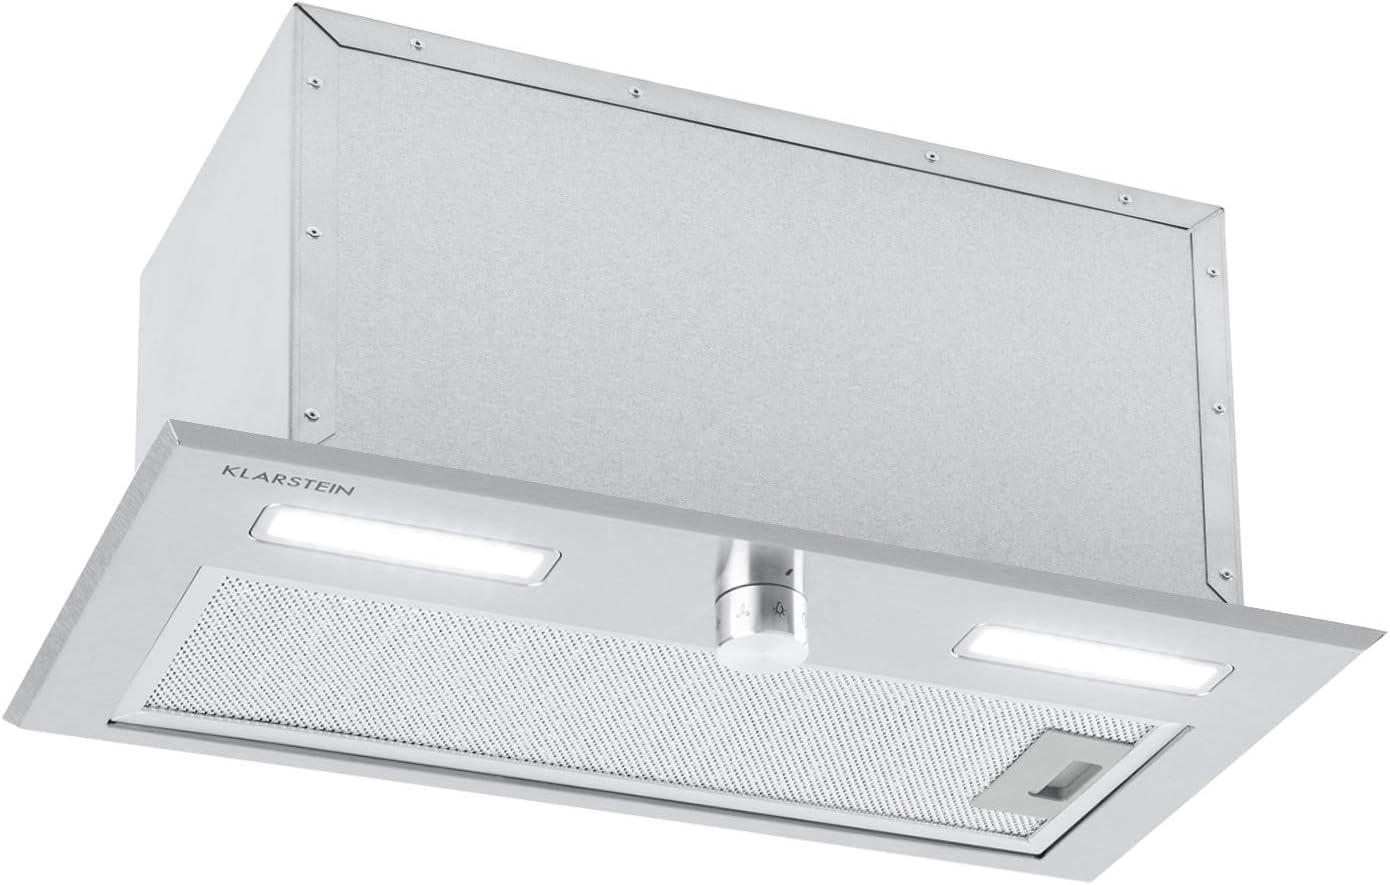 Klarstein Simplica 52 campana extractora - 52 cm de ancho, extracción de 400 m³/h, función de ventilación, botón giratorio, 3 niveles, iluminación LED de 1,5 W, acero inoxidable